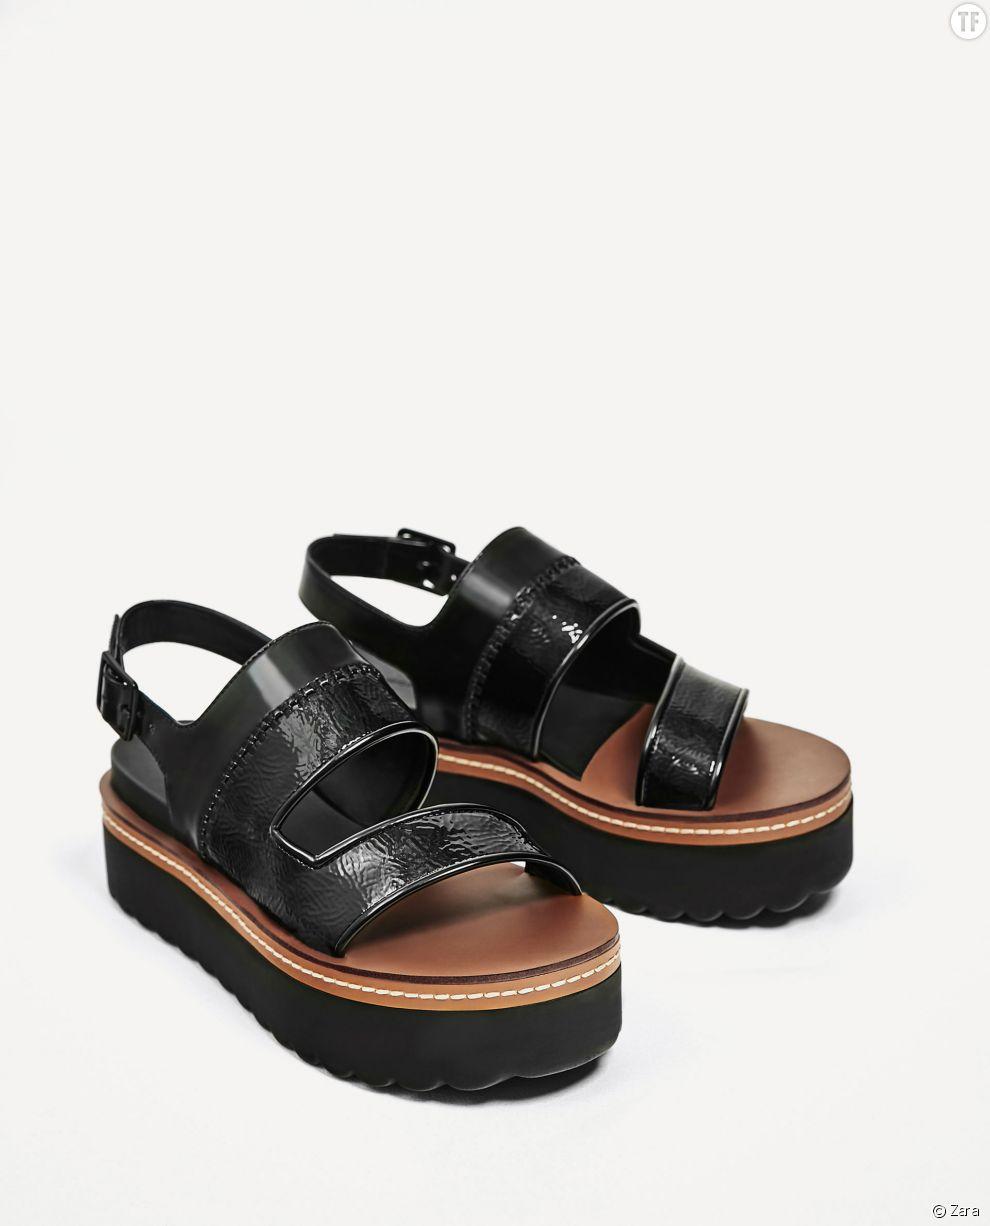 Sandales à plateforme Zara, 29,99€